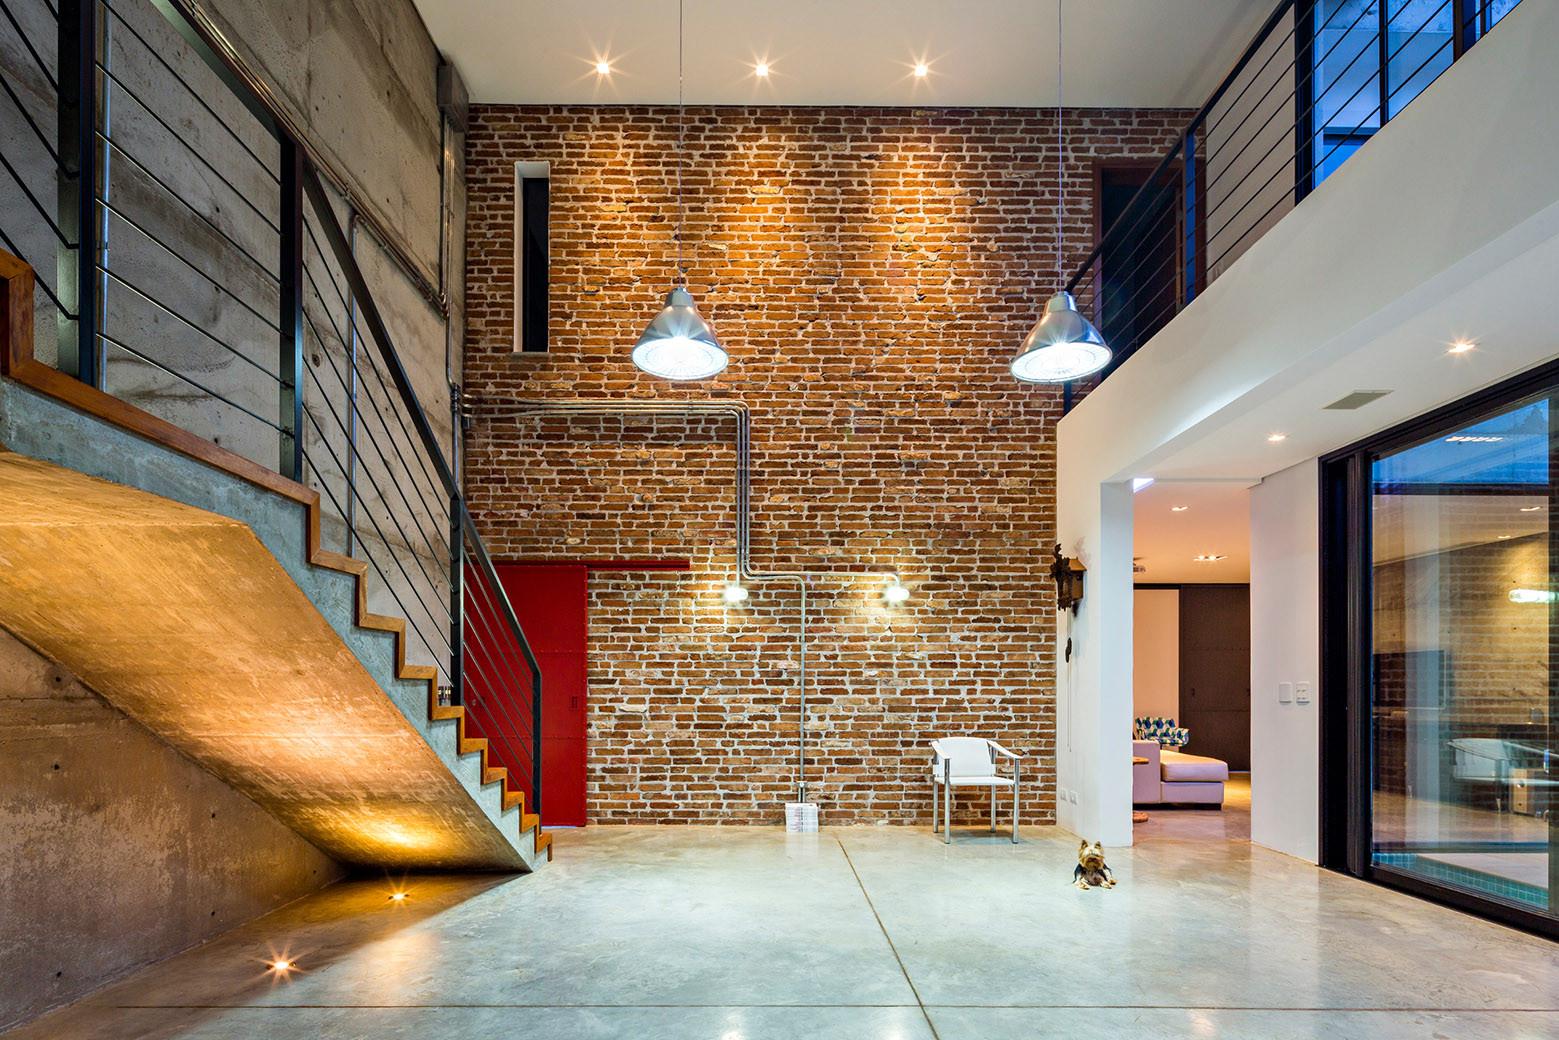 Galeria De Casa Alpha Studio Fabr Cio Roncca 8